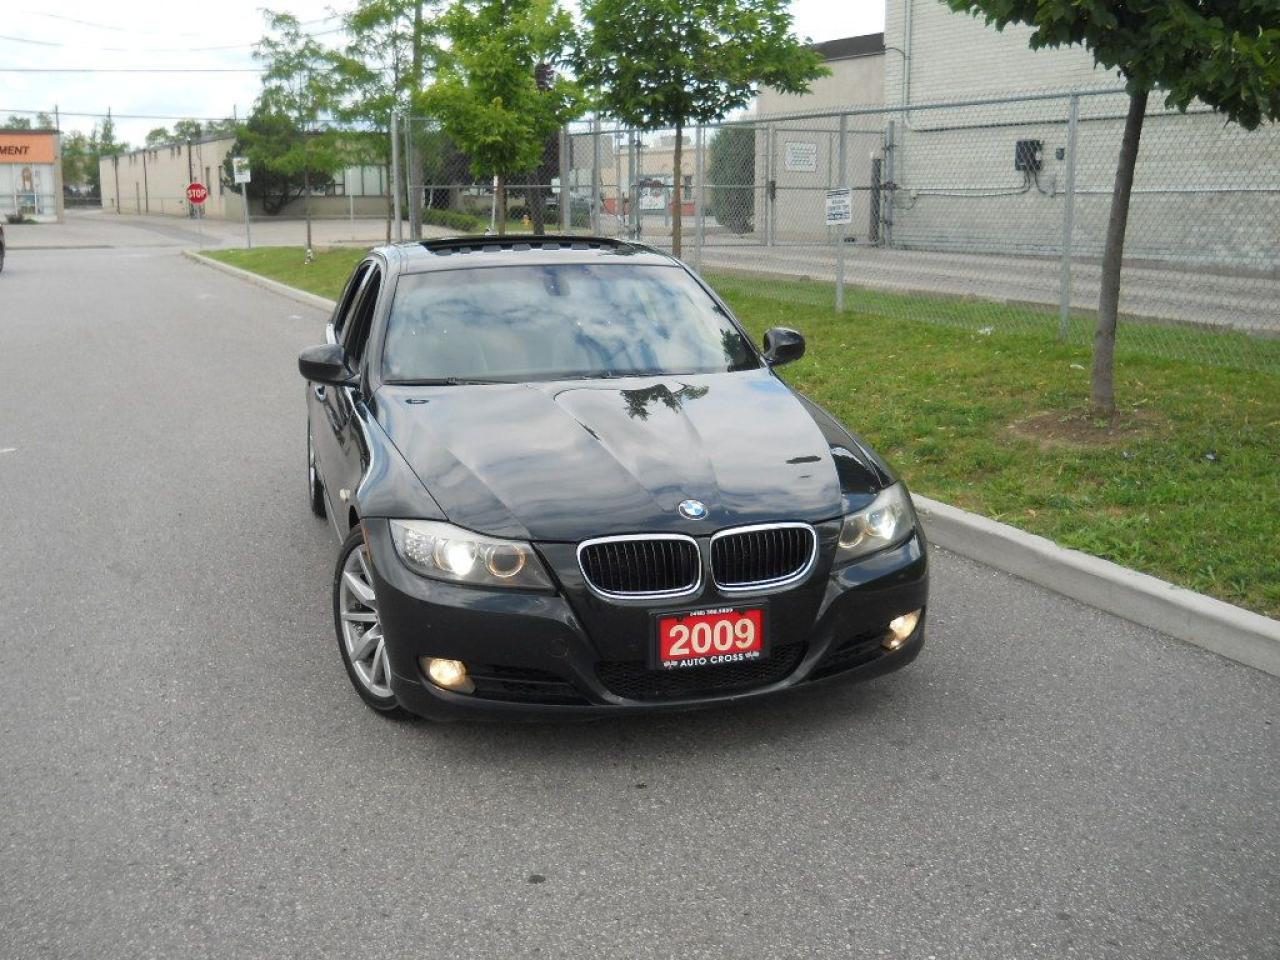 2009 BMW 328i Black on black Leather, Sunroof,3/Y